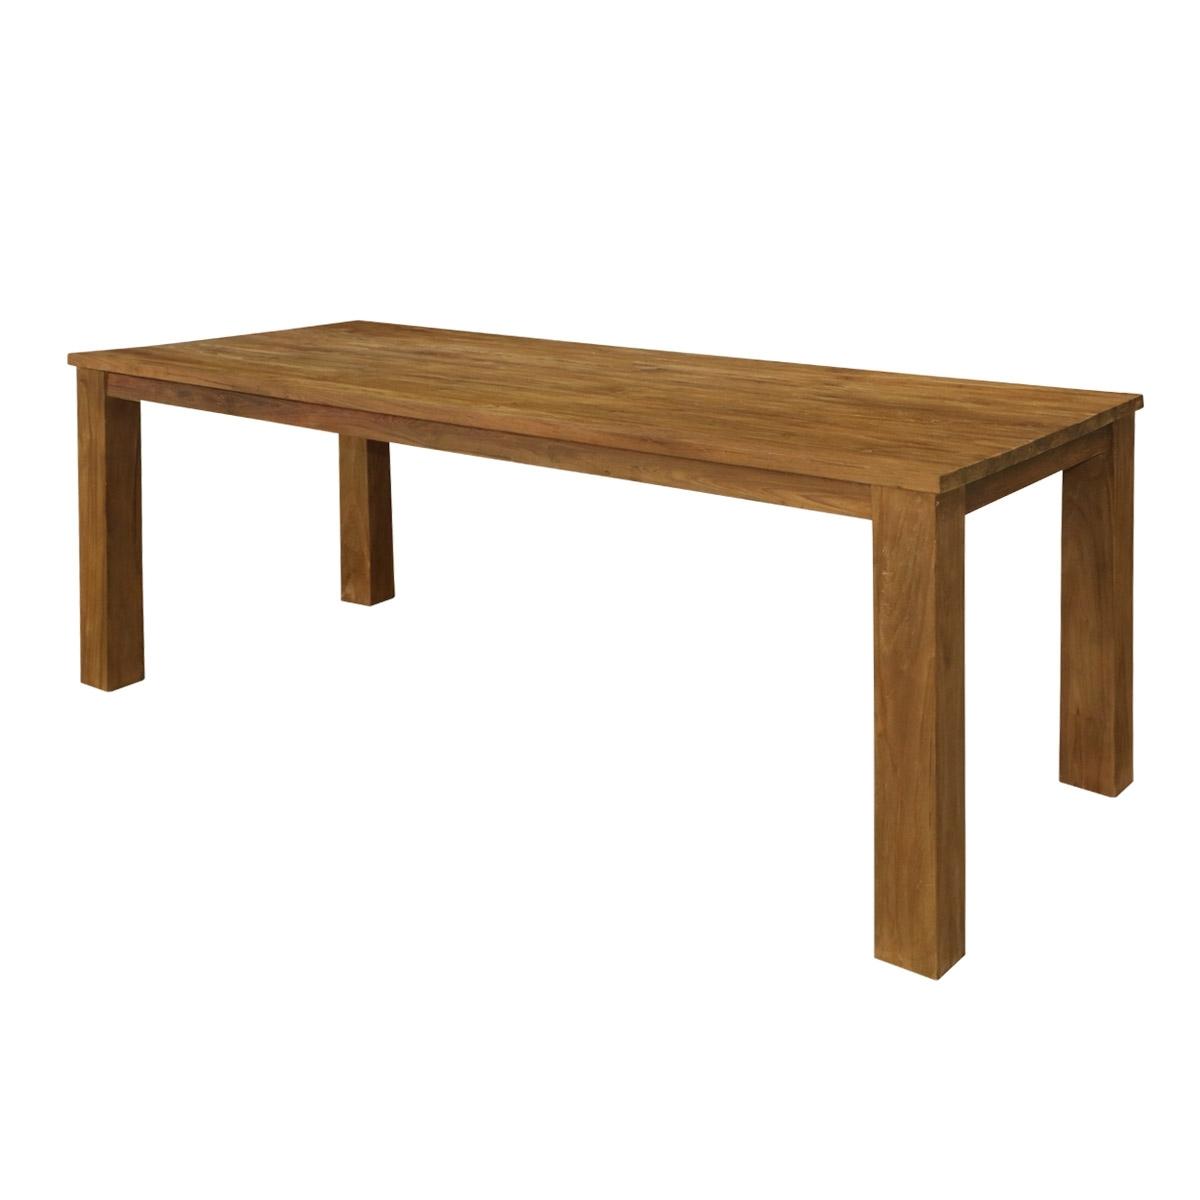 Edmonton Dining Tables Regarding Famous Edmonton Contemporary Reclaimed Teak Wood Rectangle Large Dining Table (View 8 of 25)